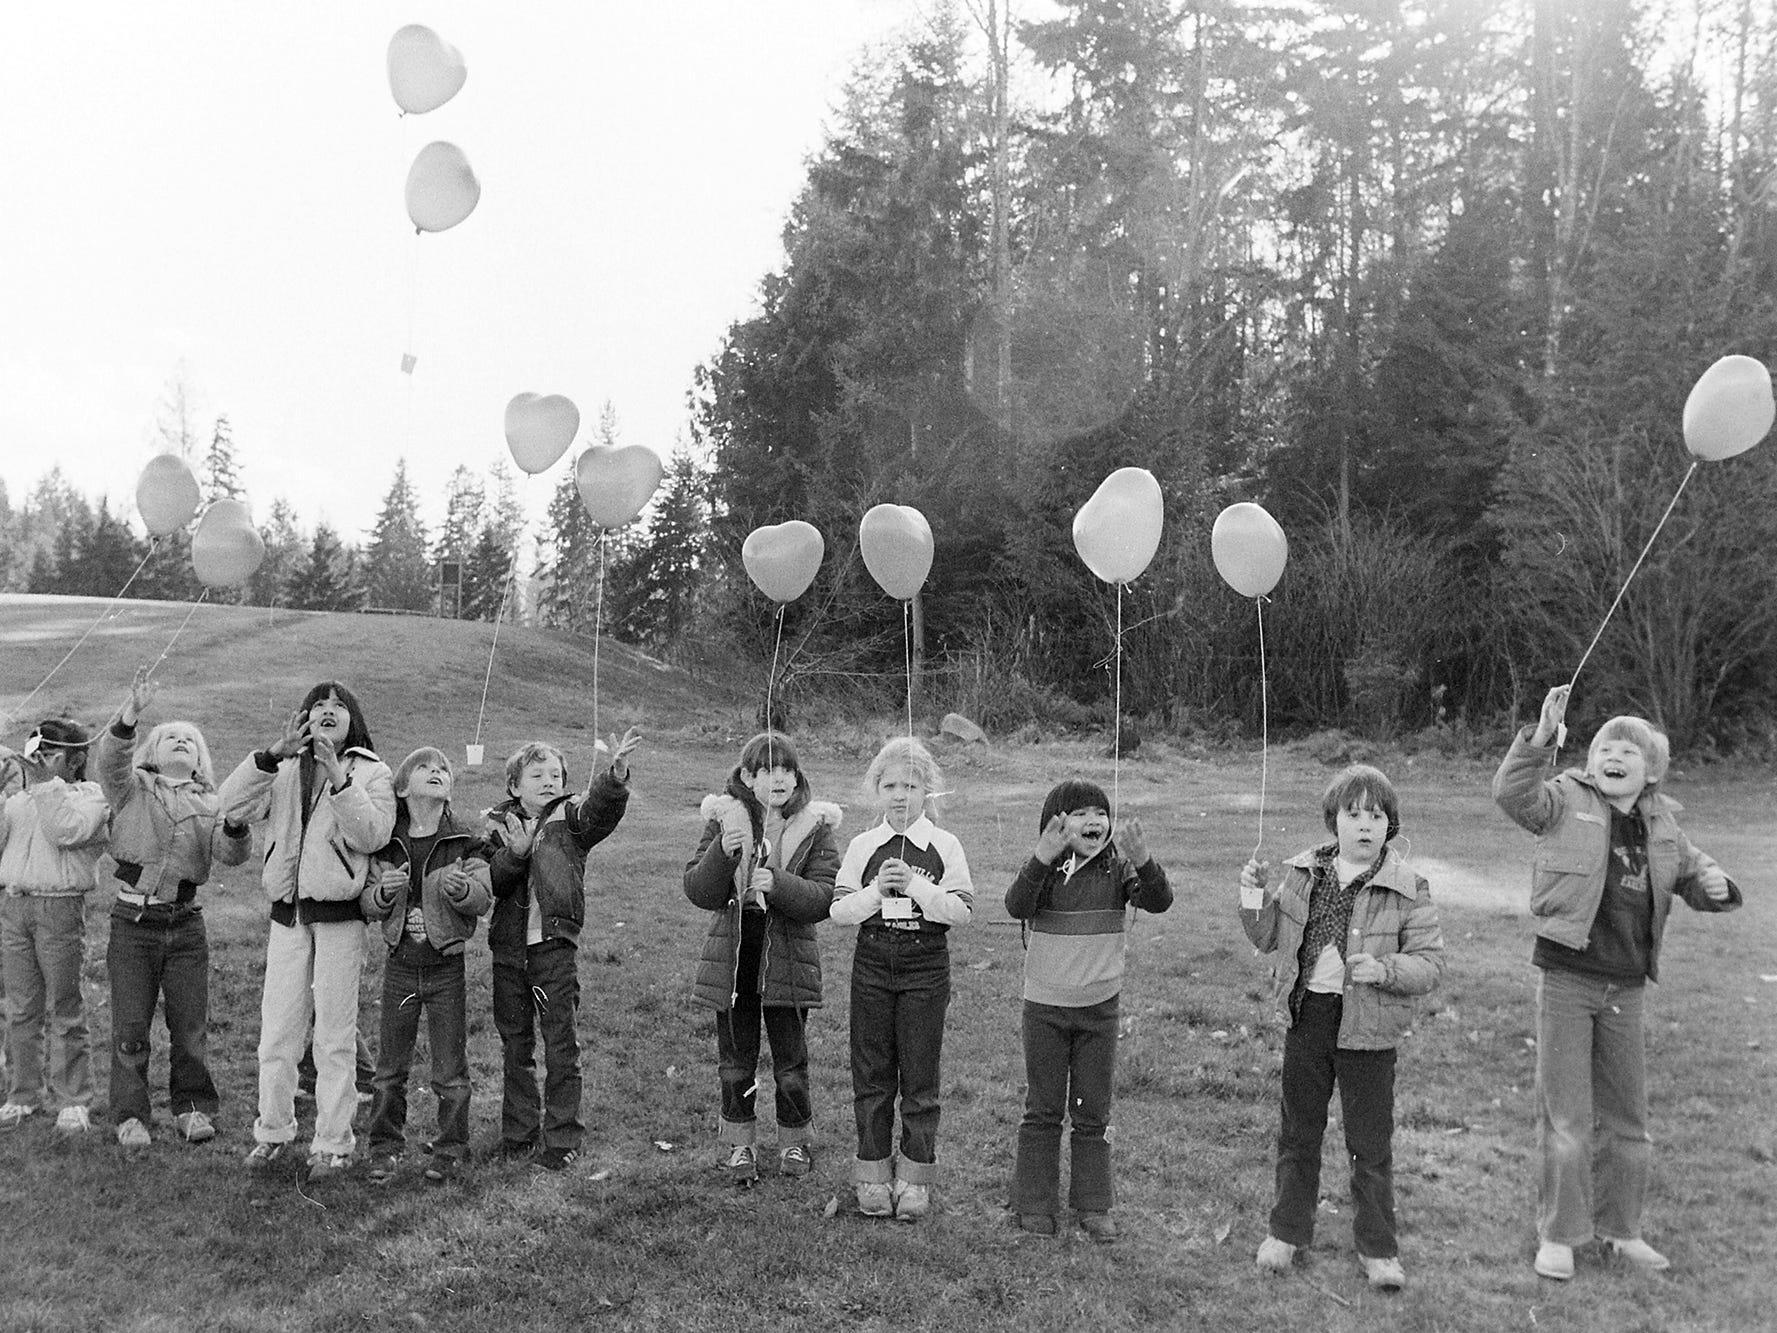 02/18/84Balloon Release